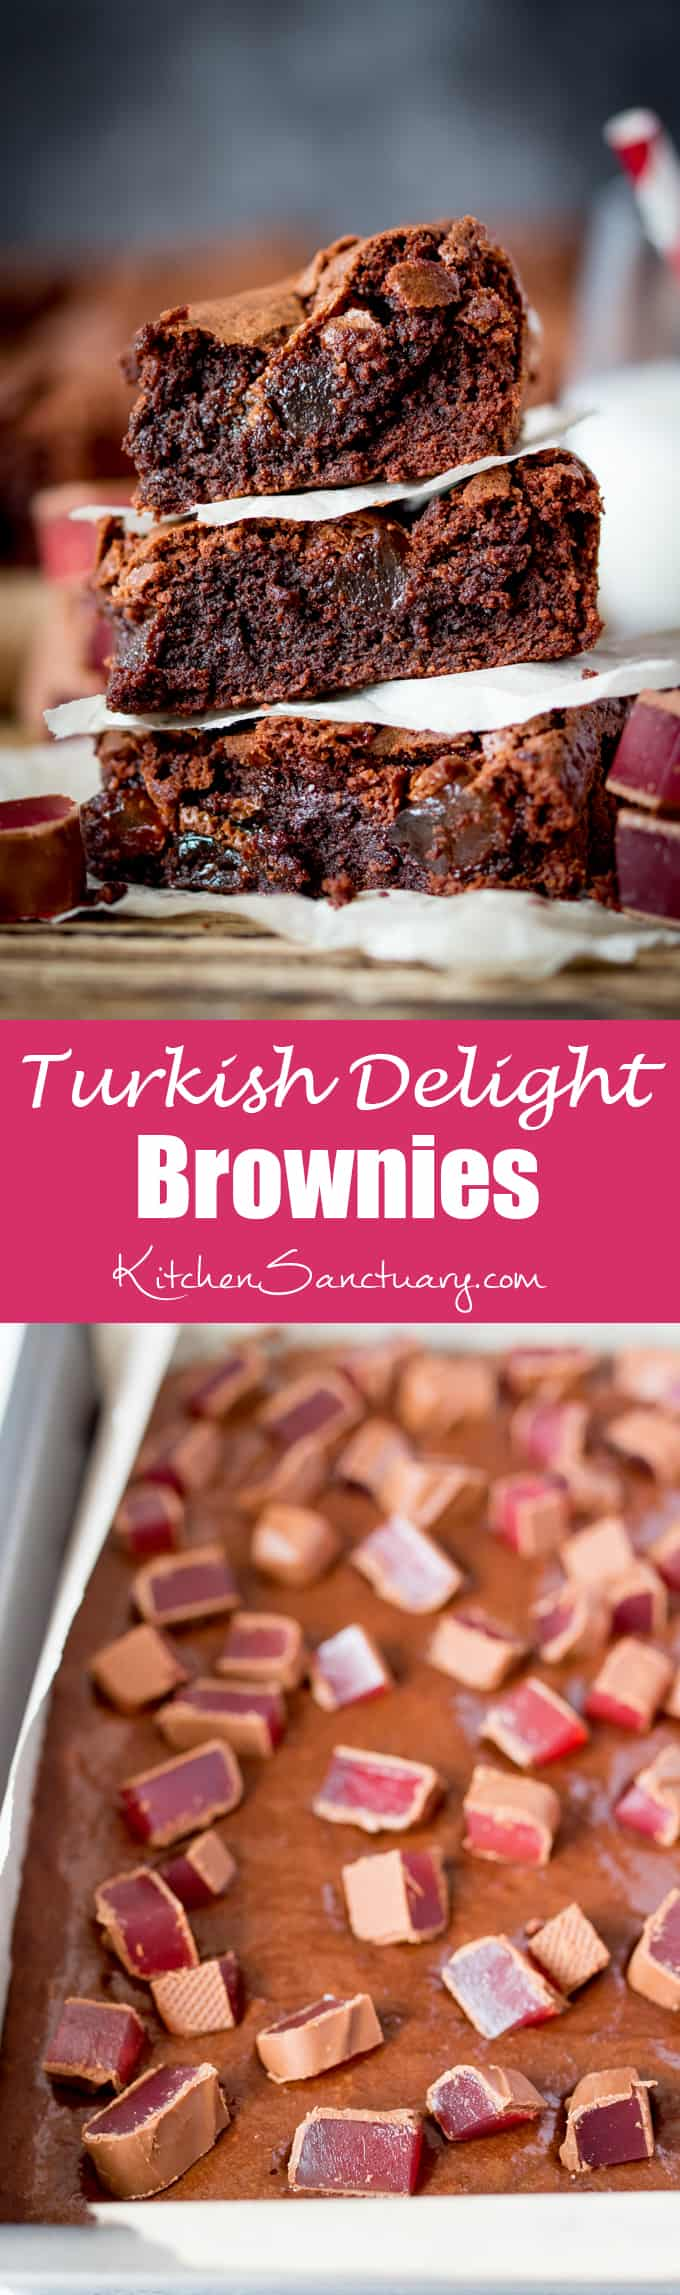 Turkish Delight Brownies - squidgy chocolate brownies with a crisp, meringue-like top, stuffed with chunks of chocolate-covered Turkish delight.